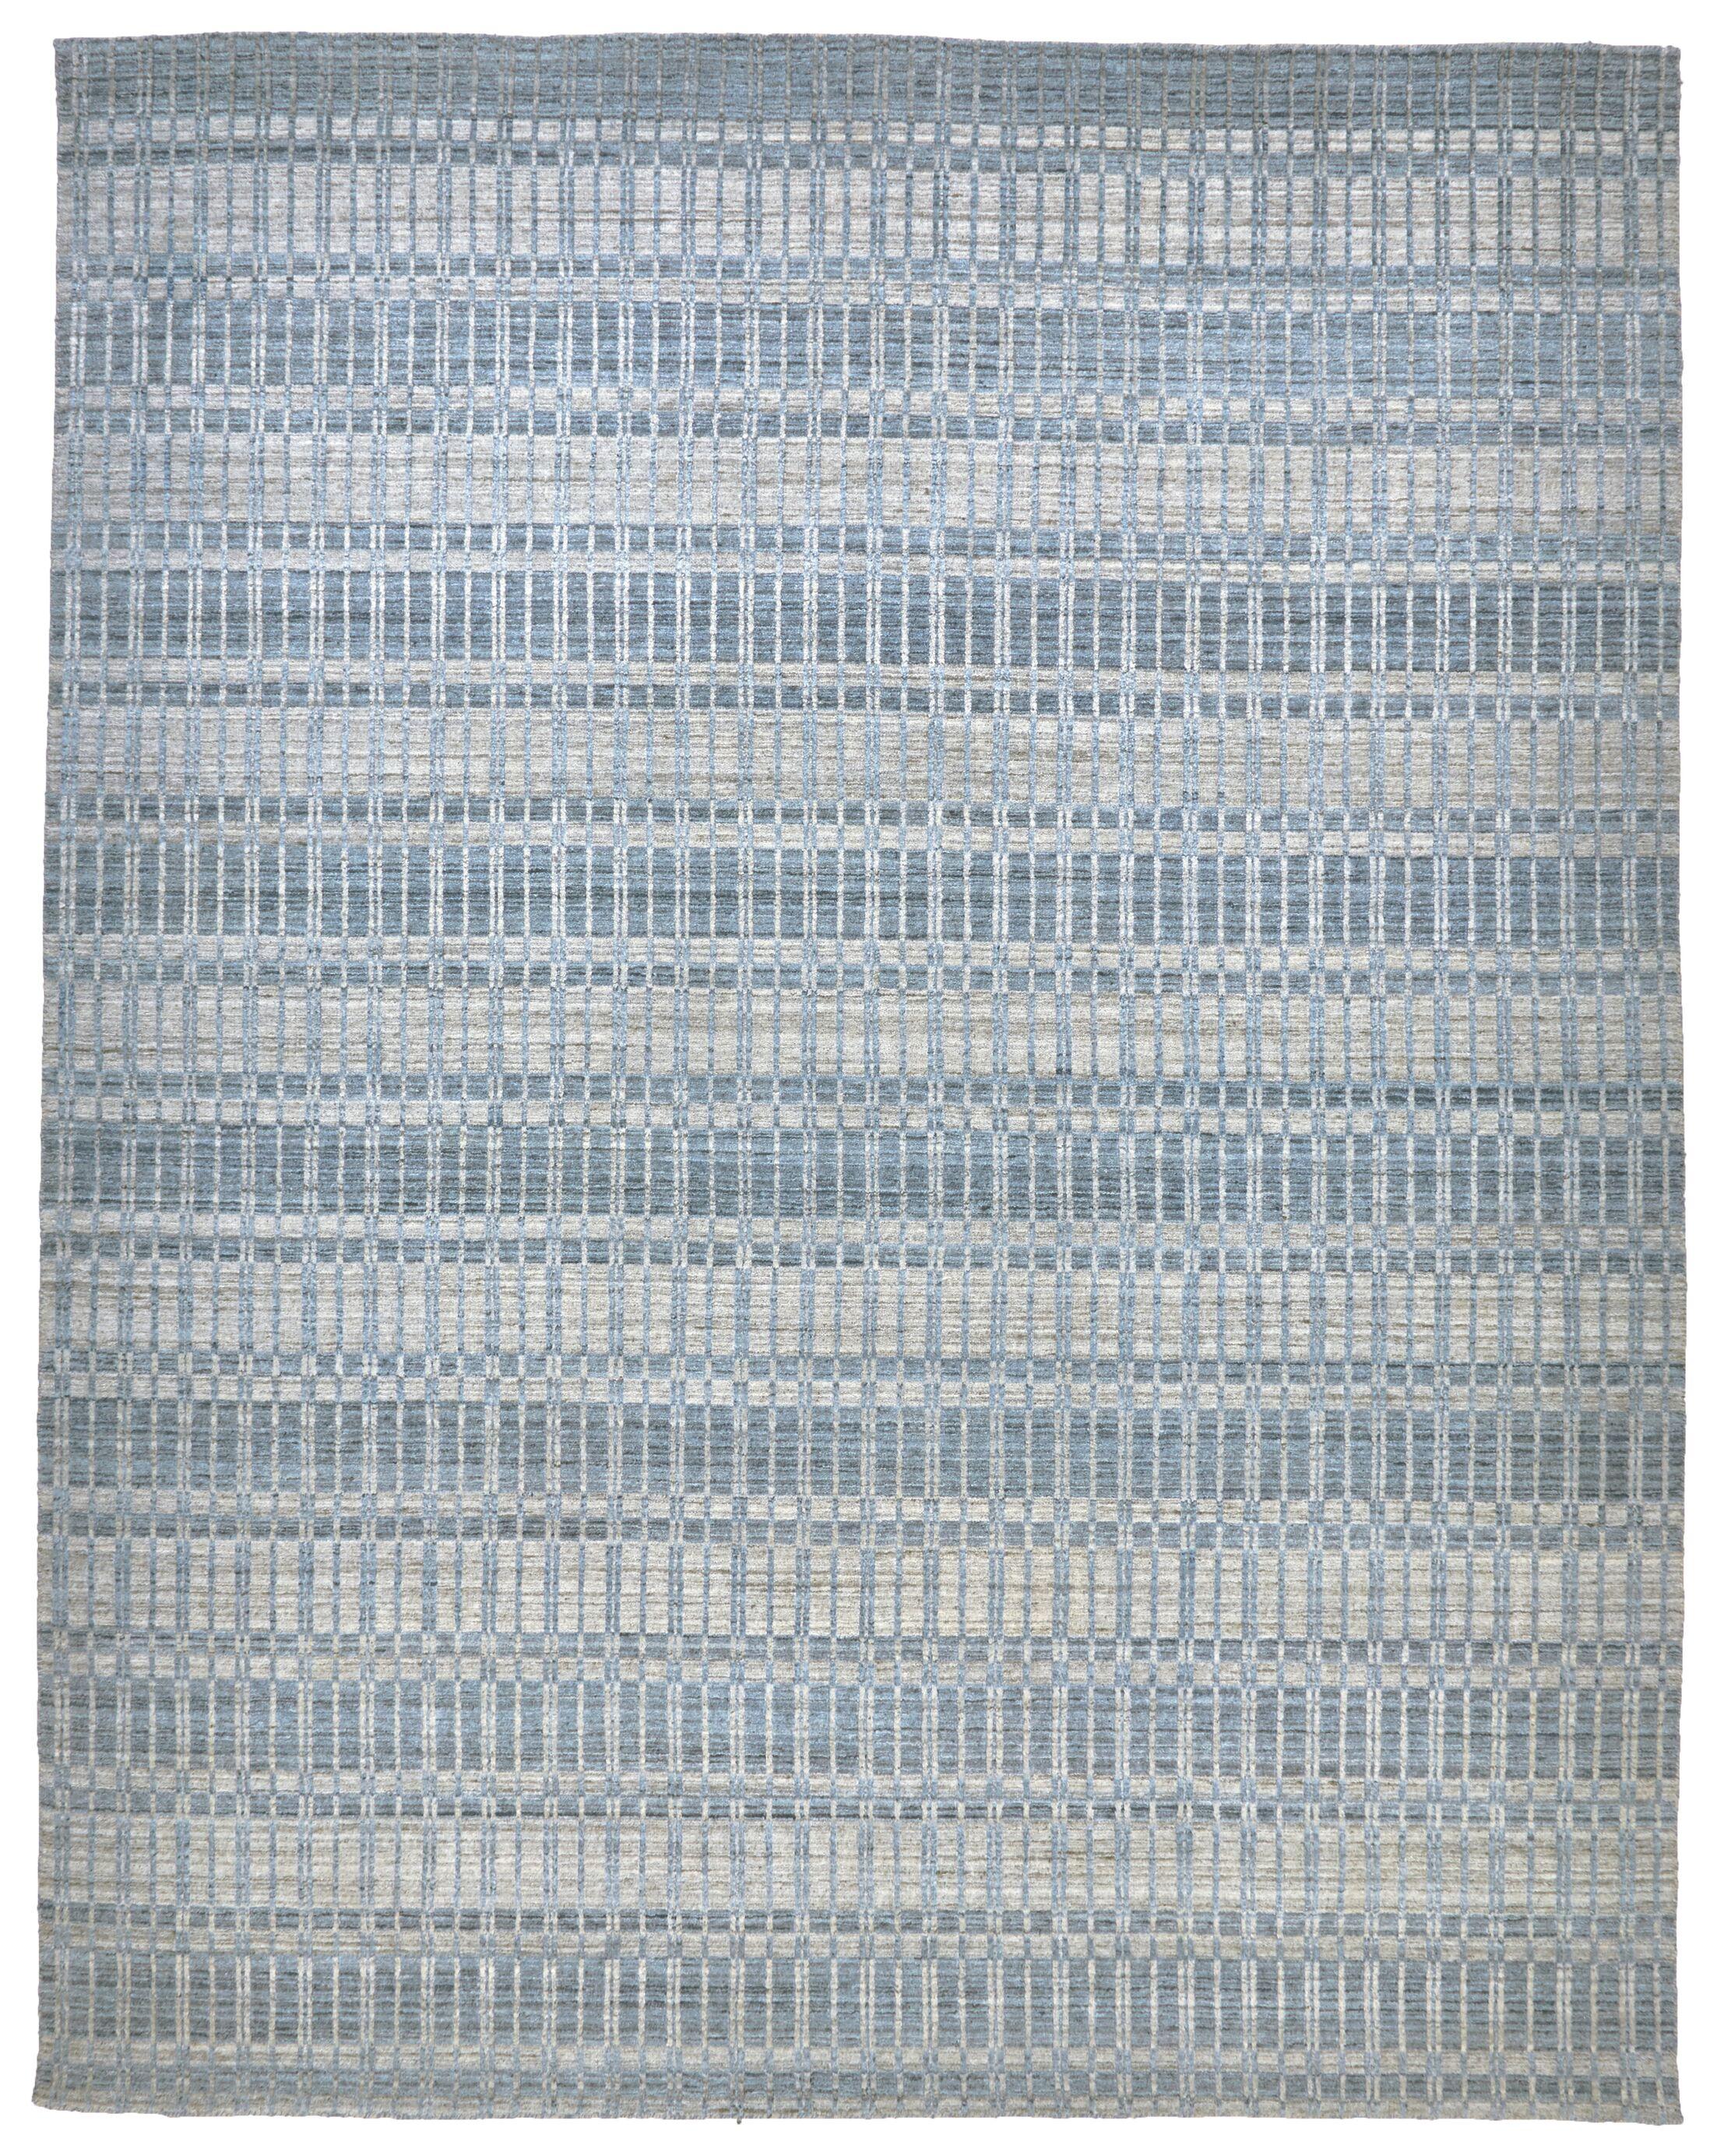 Dellaposta Hand-Woven Blue/Silver Area Rug Rug Size: Rectangle 5' x 7'6